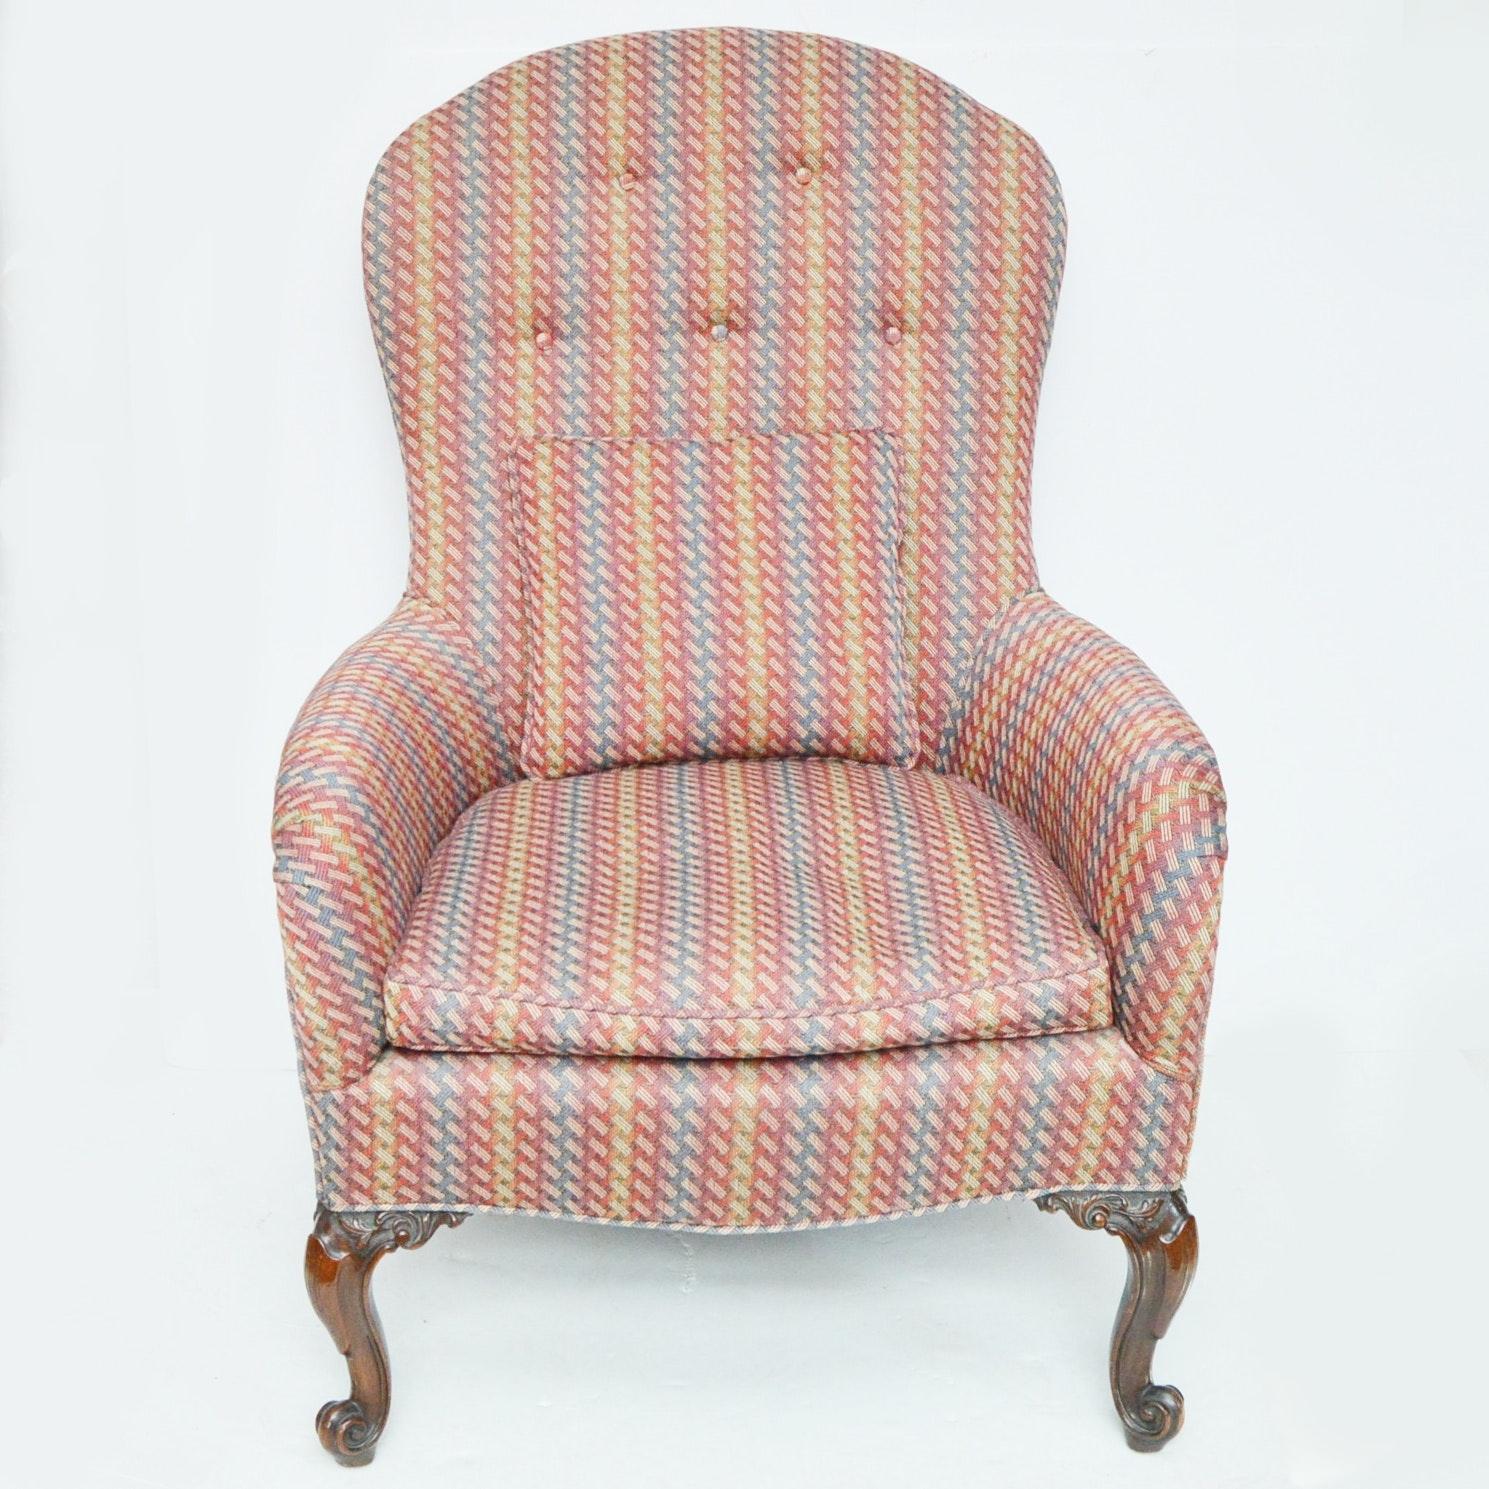 Queen Anne Style Armchair